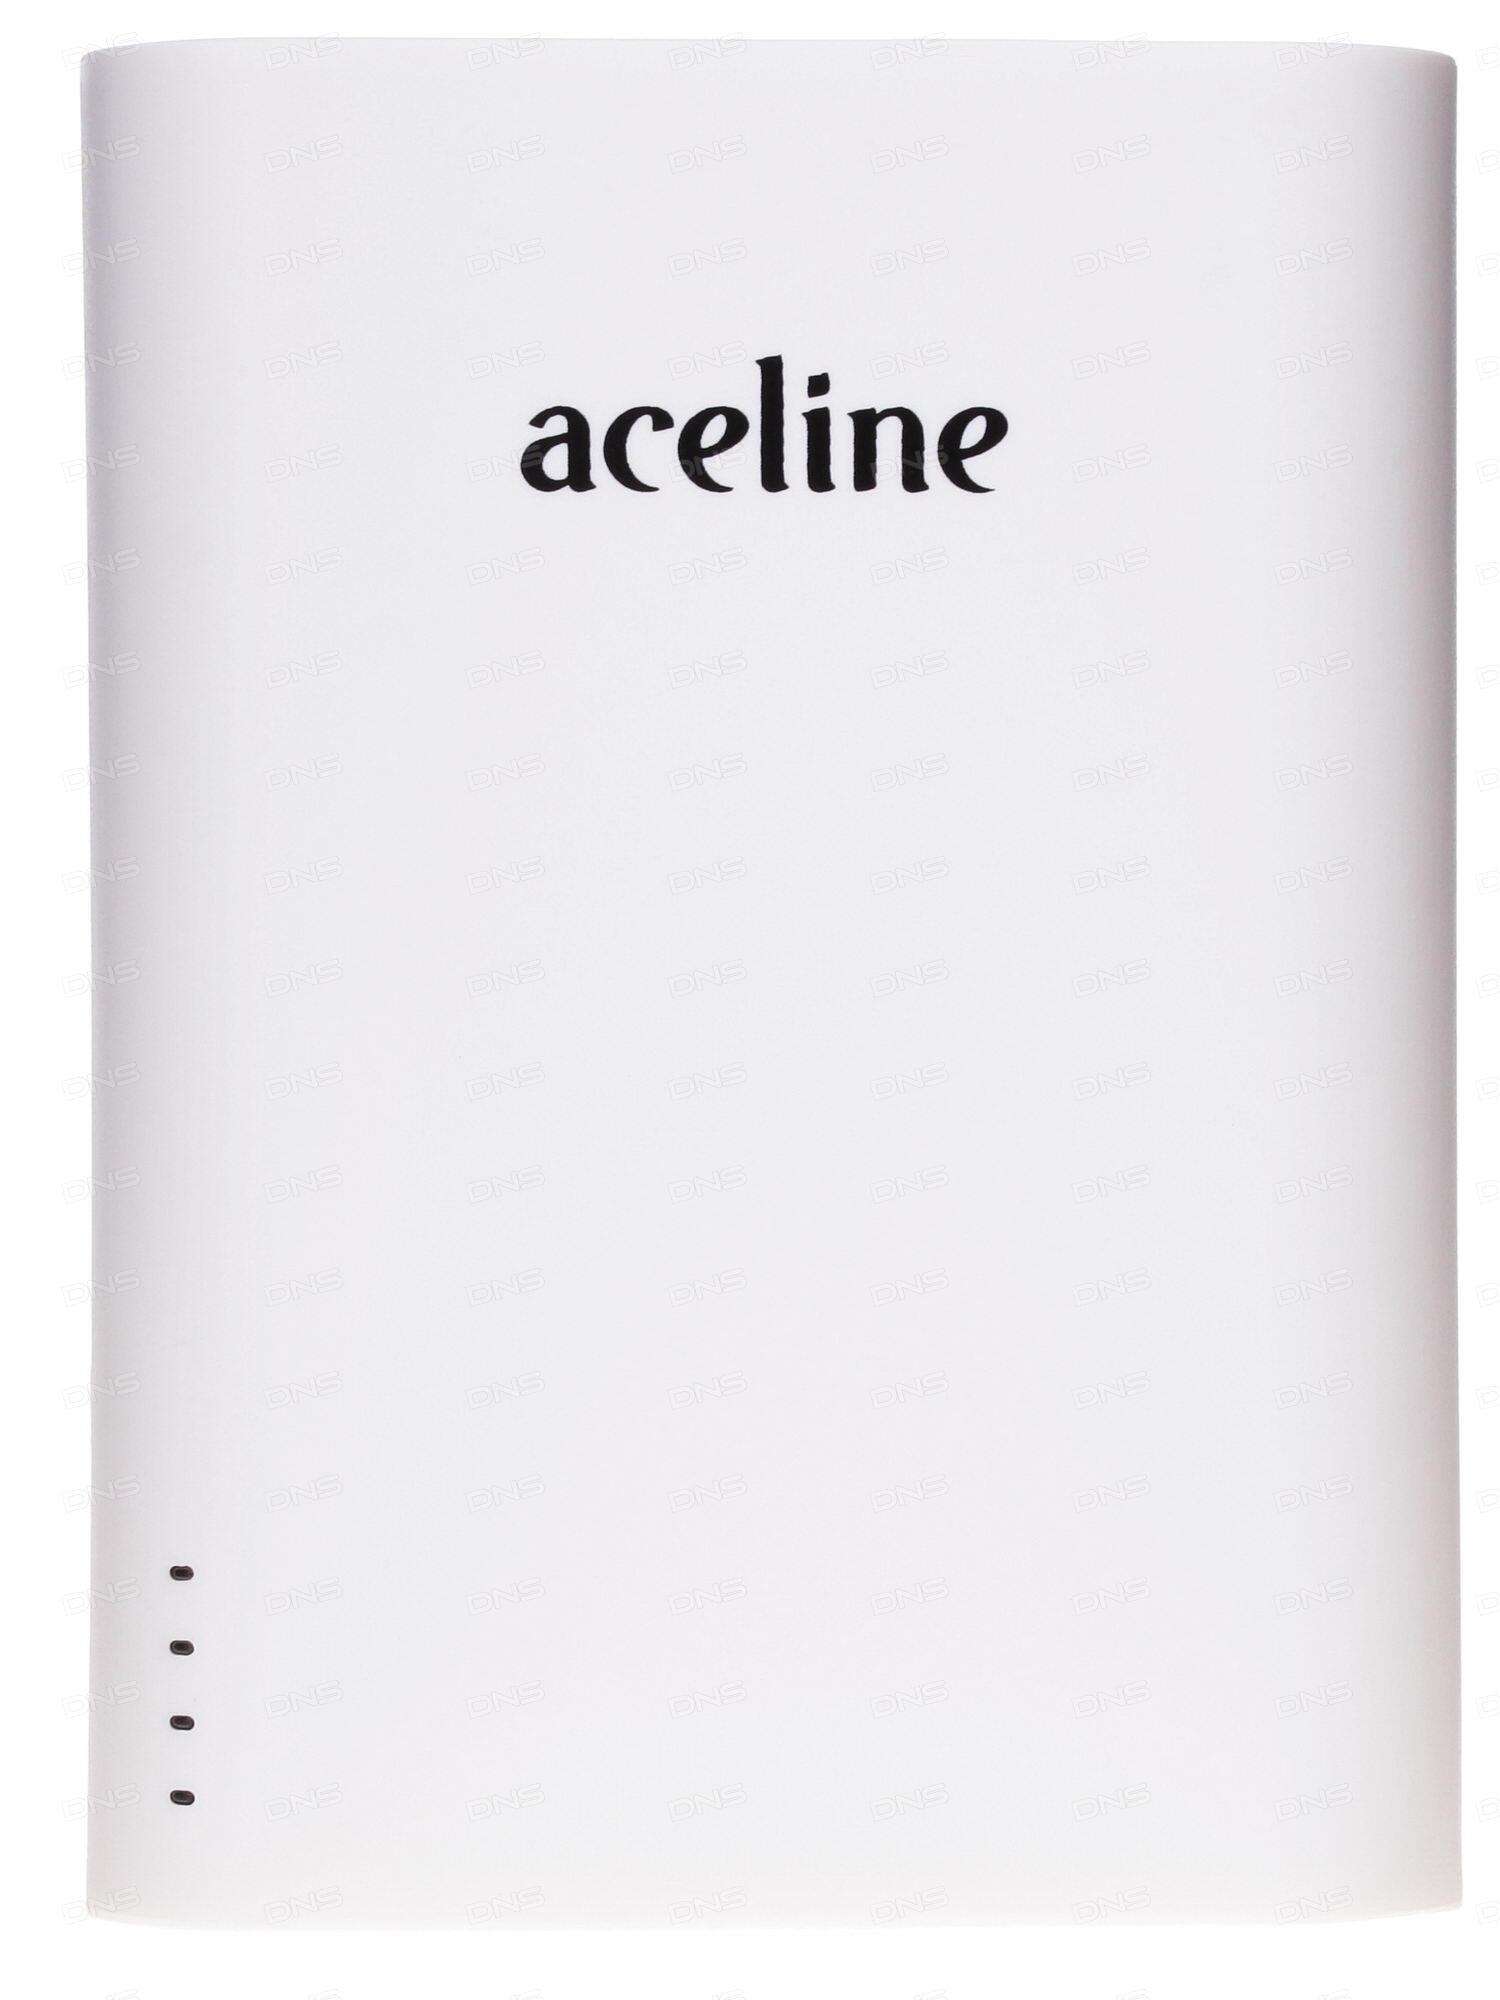 aceline